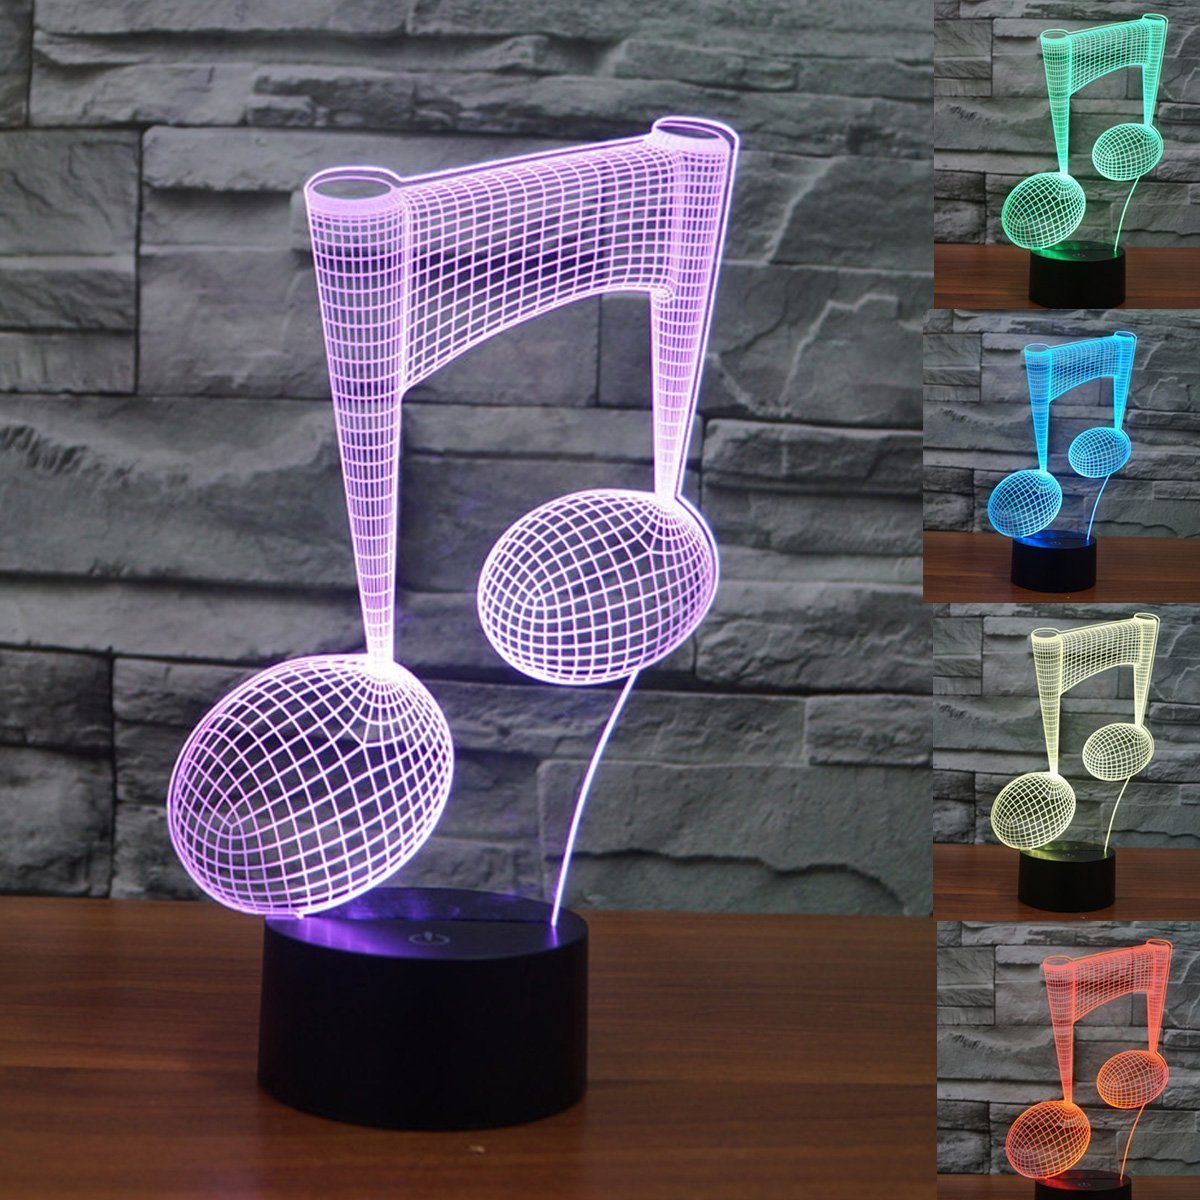 3D Lamp Desk, Ephvan 3D Music Visualization 7 Colors Change Optical Illusion Led Touch Sensor Lamp Atmosphere Bedside Lamp for Home Décor,Children Friend Gift